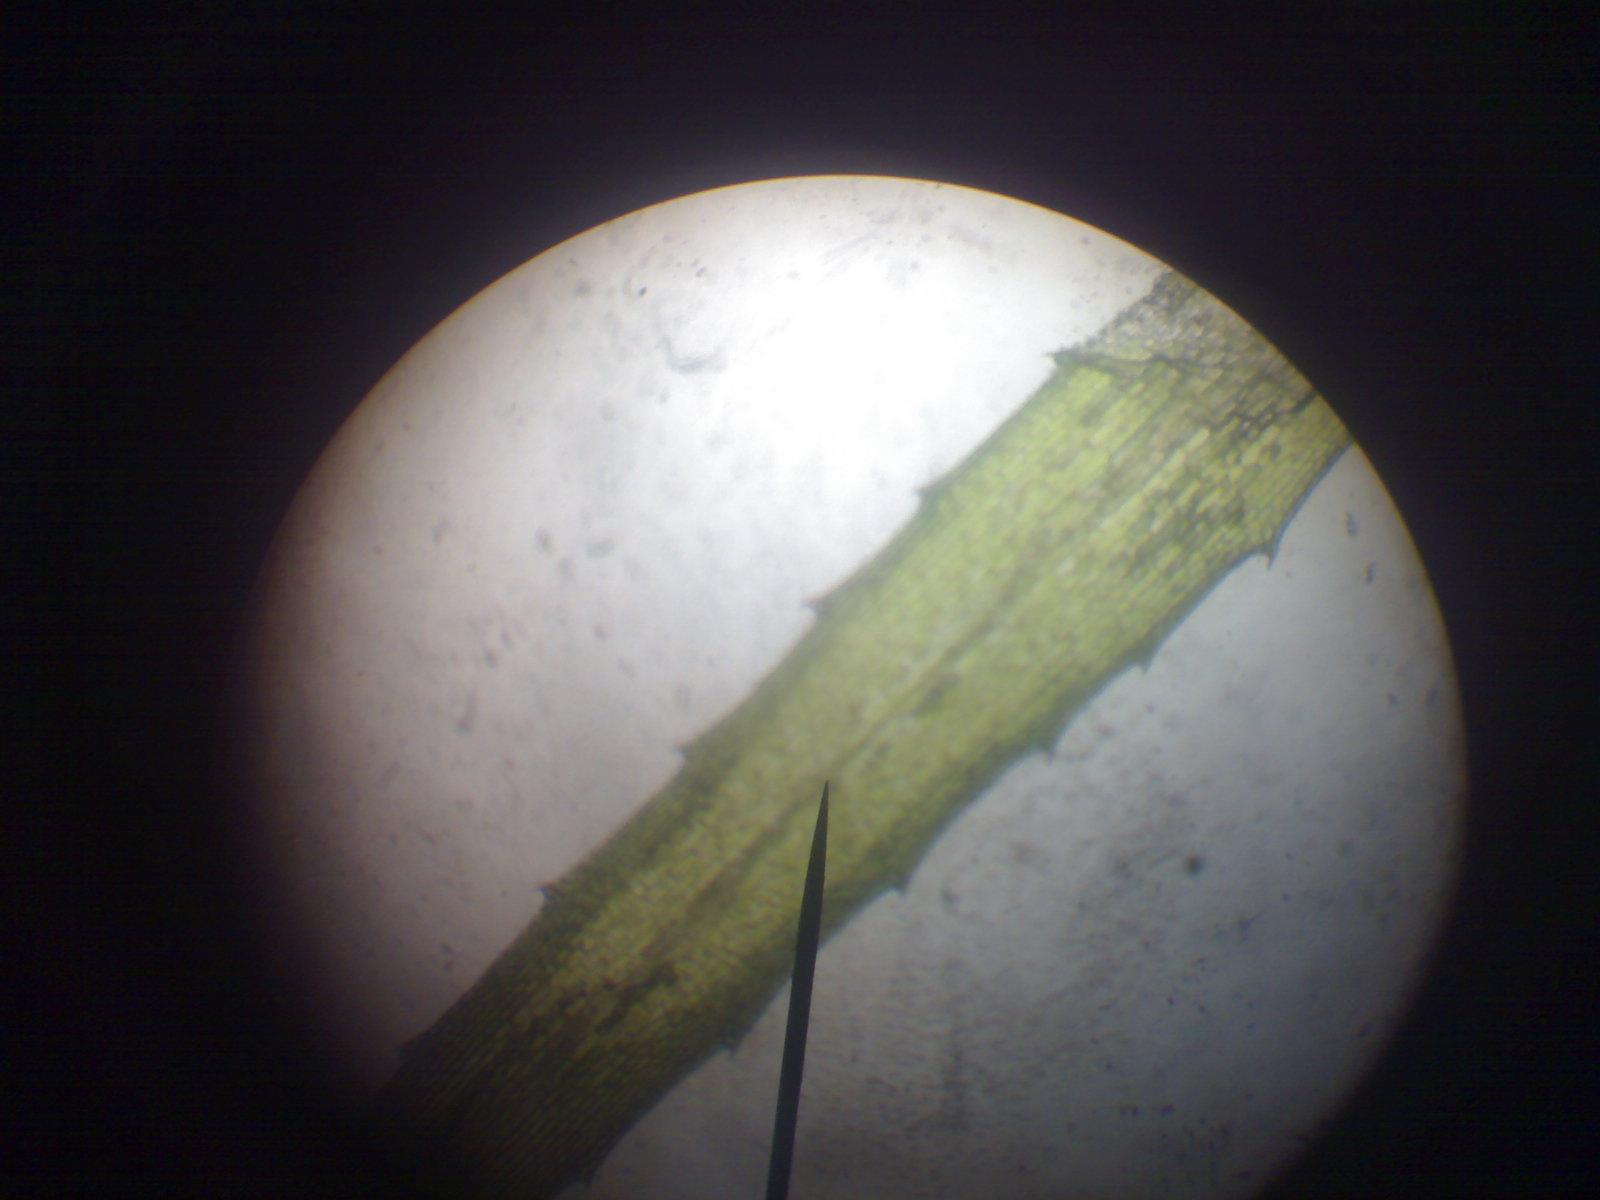 Buku biologi universitas tentang mikroskop laporan praktikum